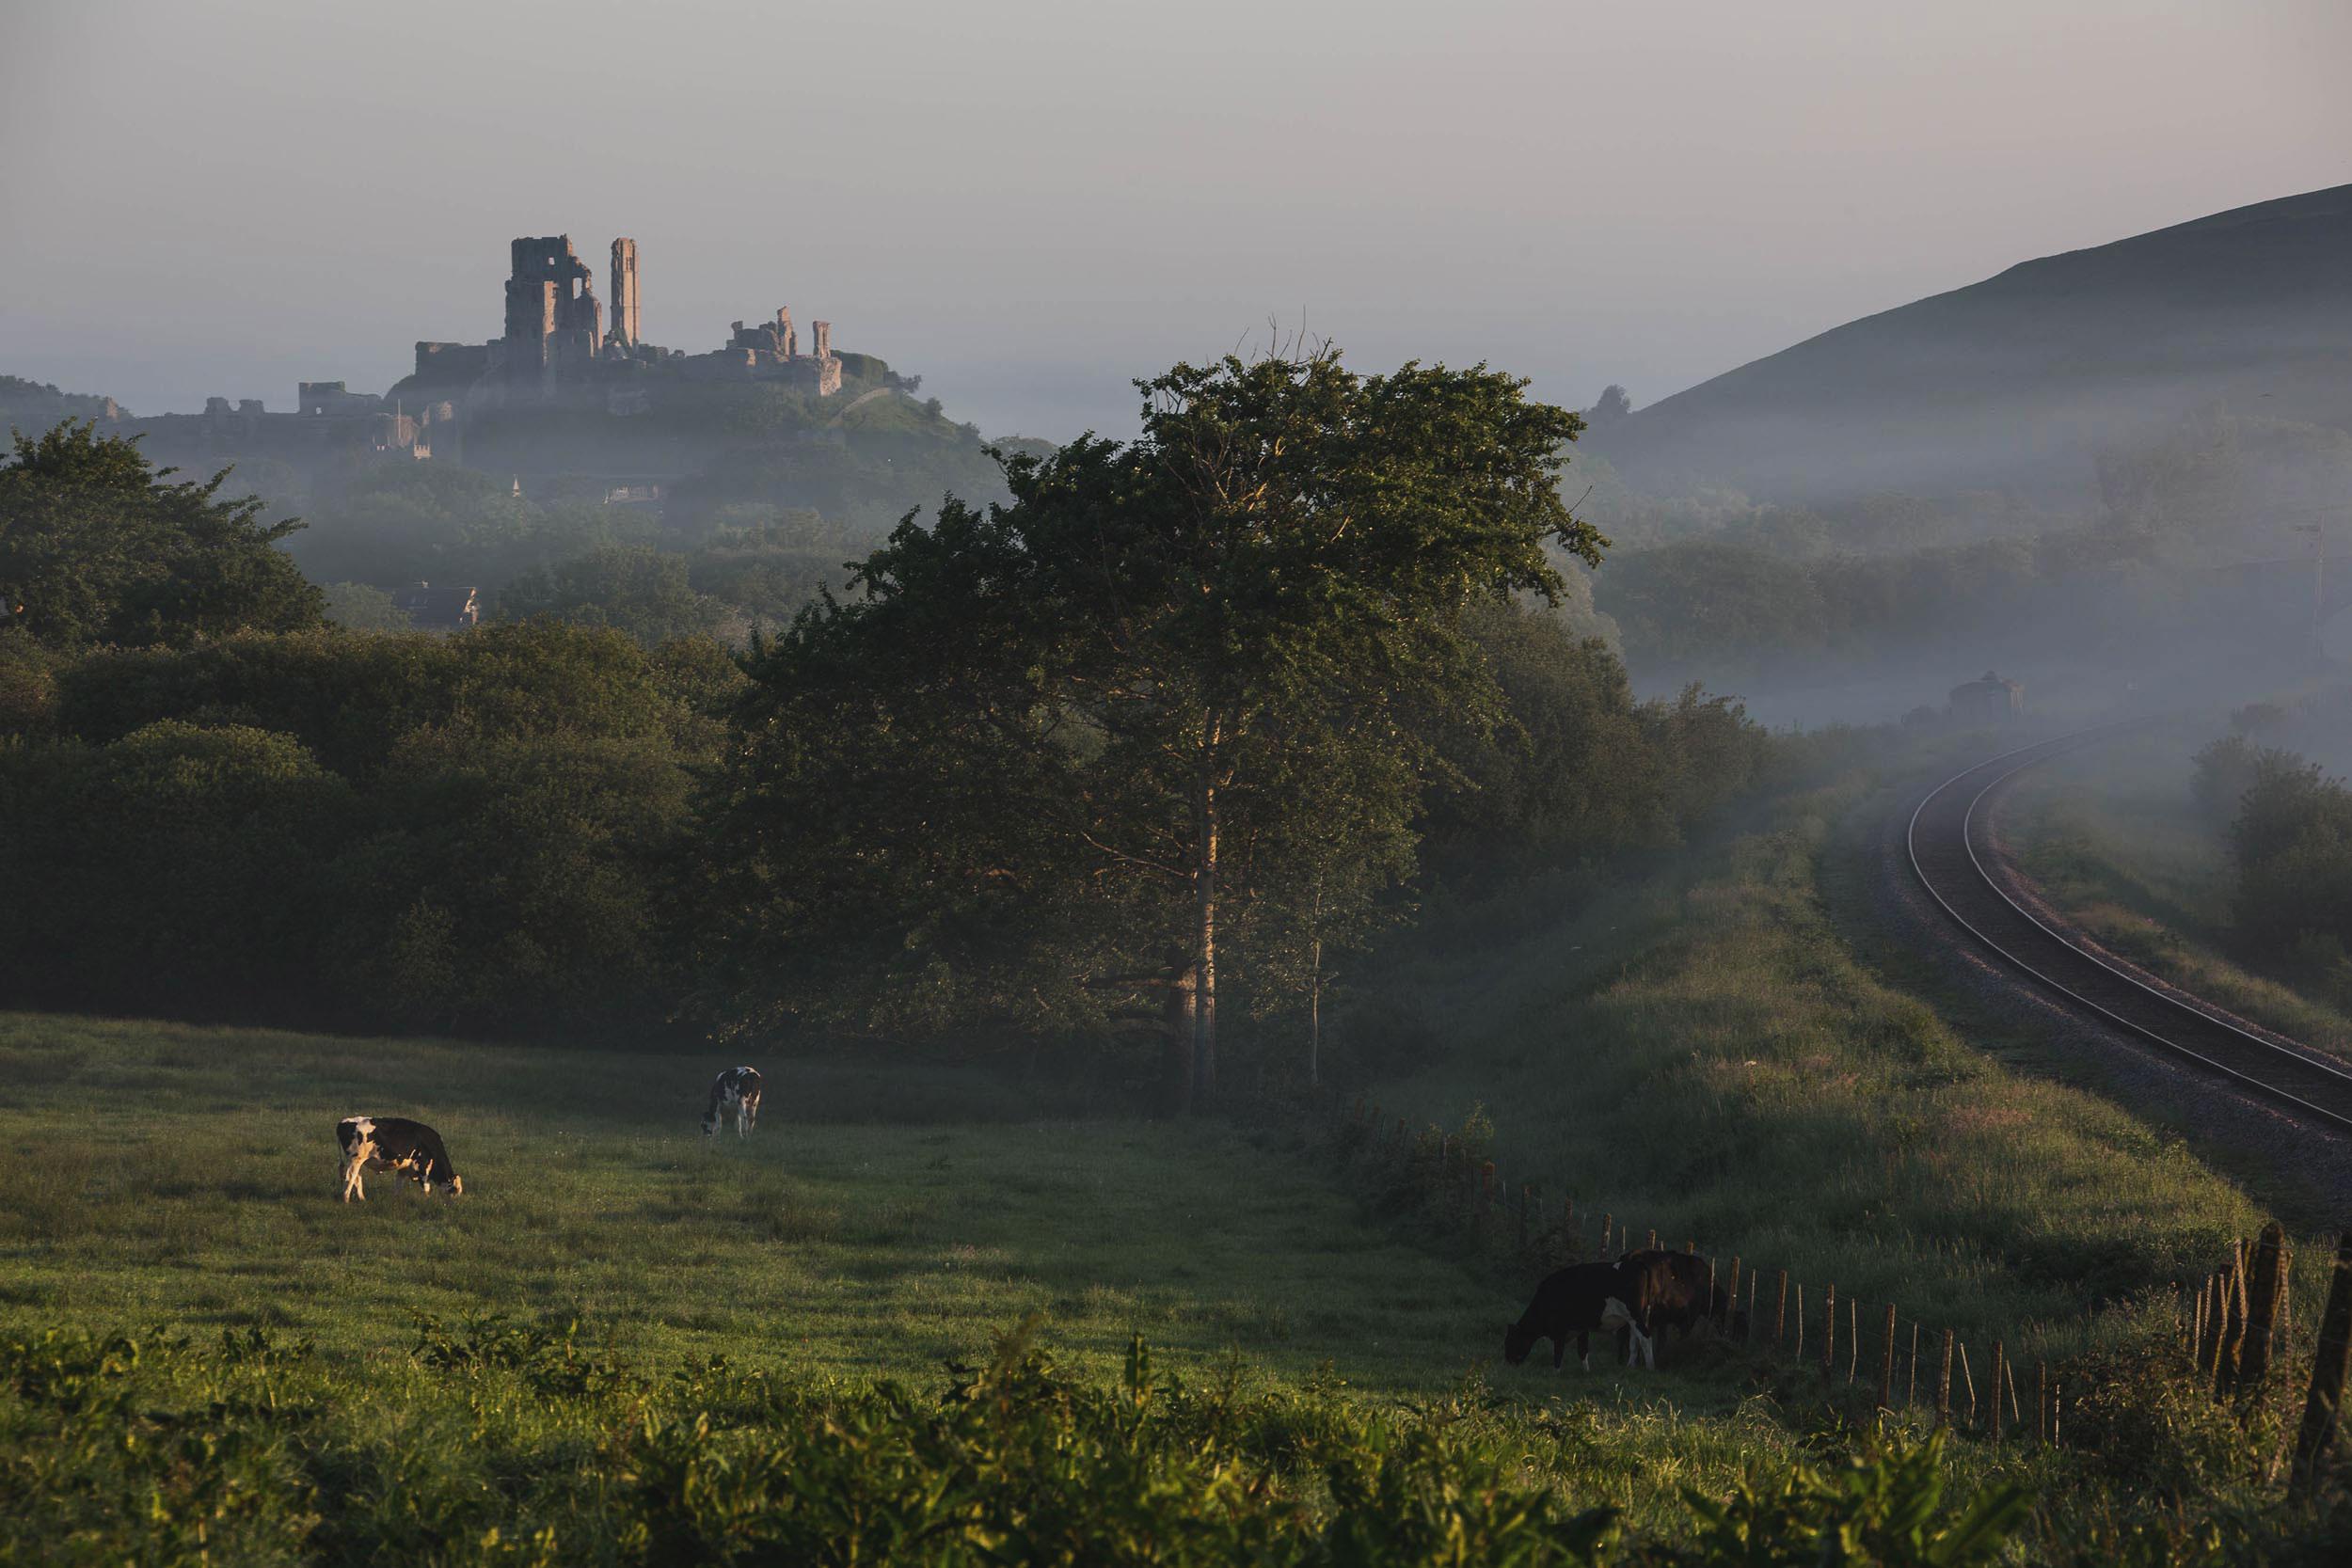 The heart of Dorset